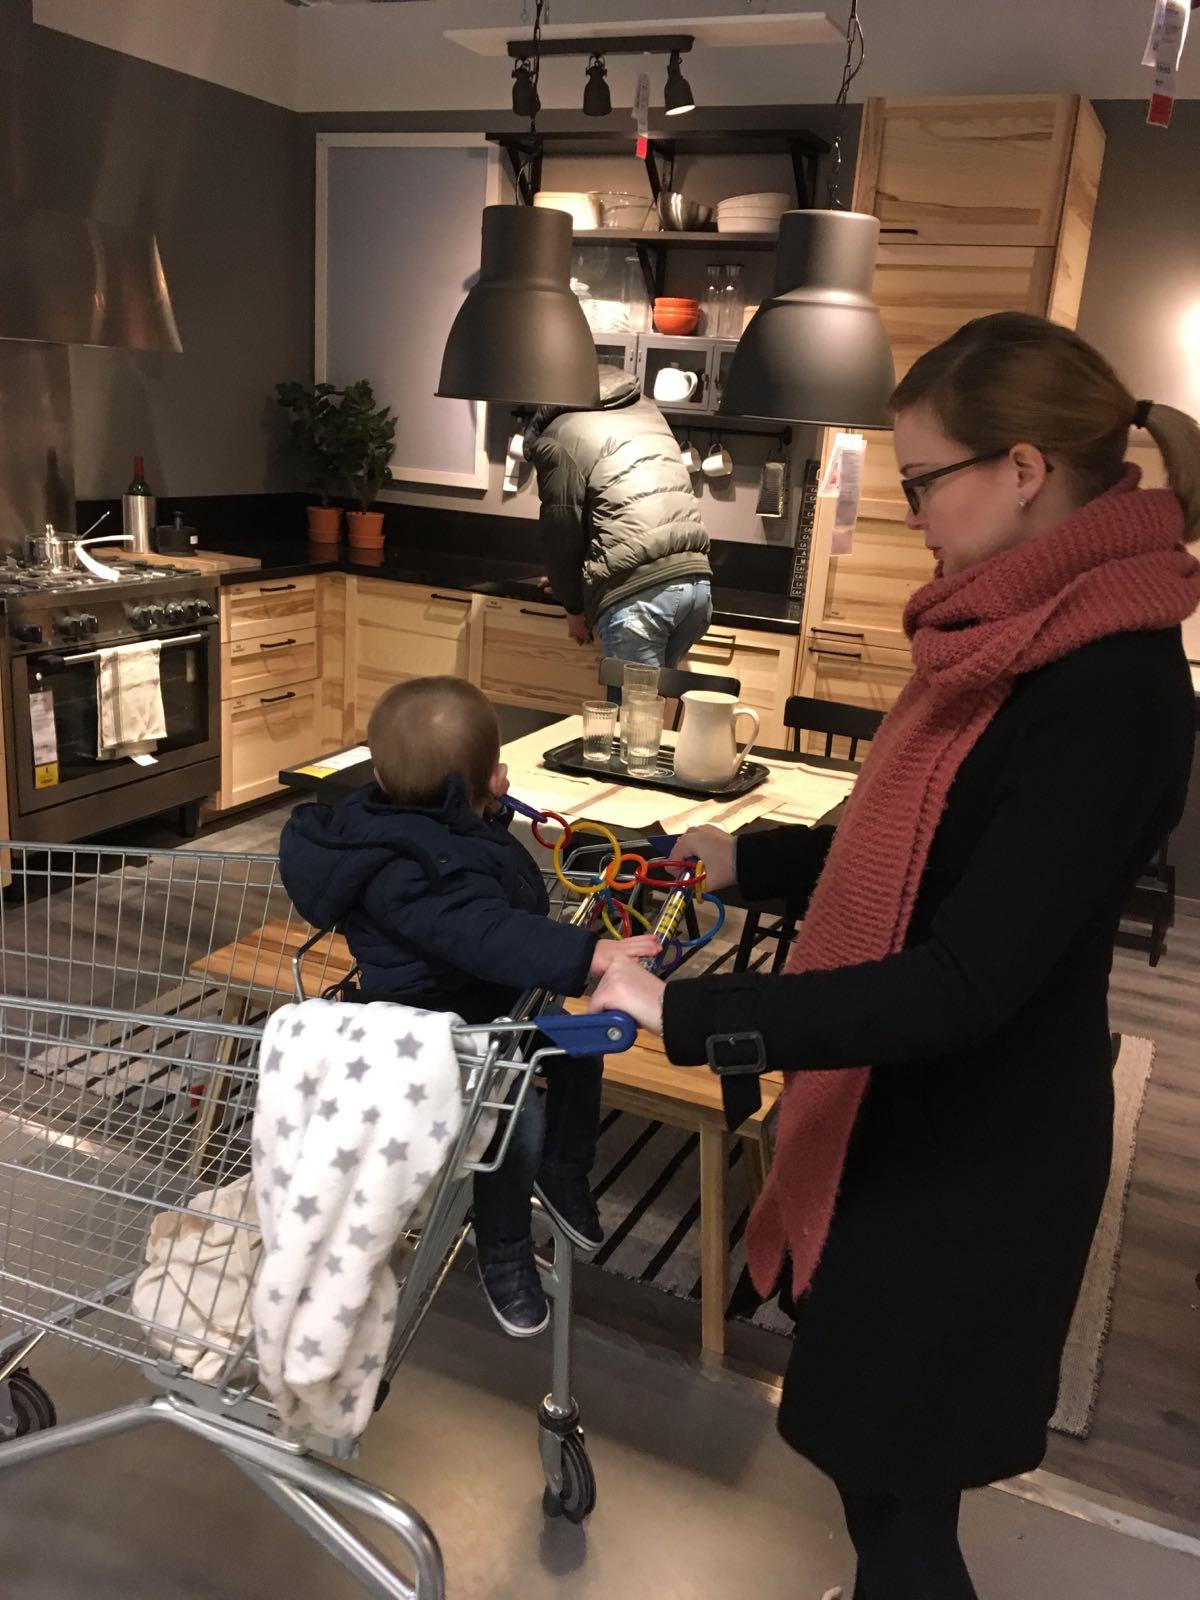 IMG 3174 - Elise's Weekly Pictorama Januari 2017 #2 -Ikea, Sporten & Pretbekken